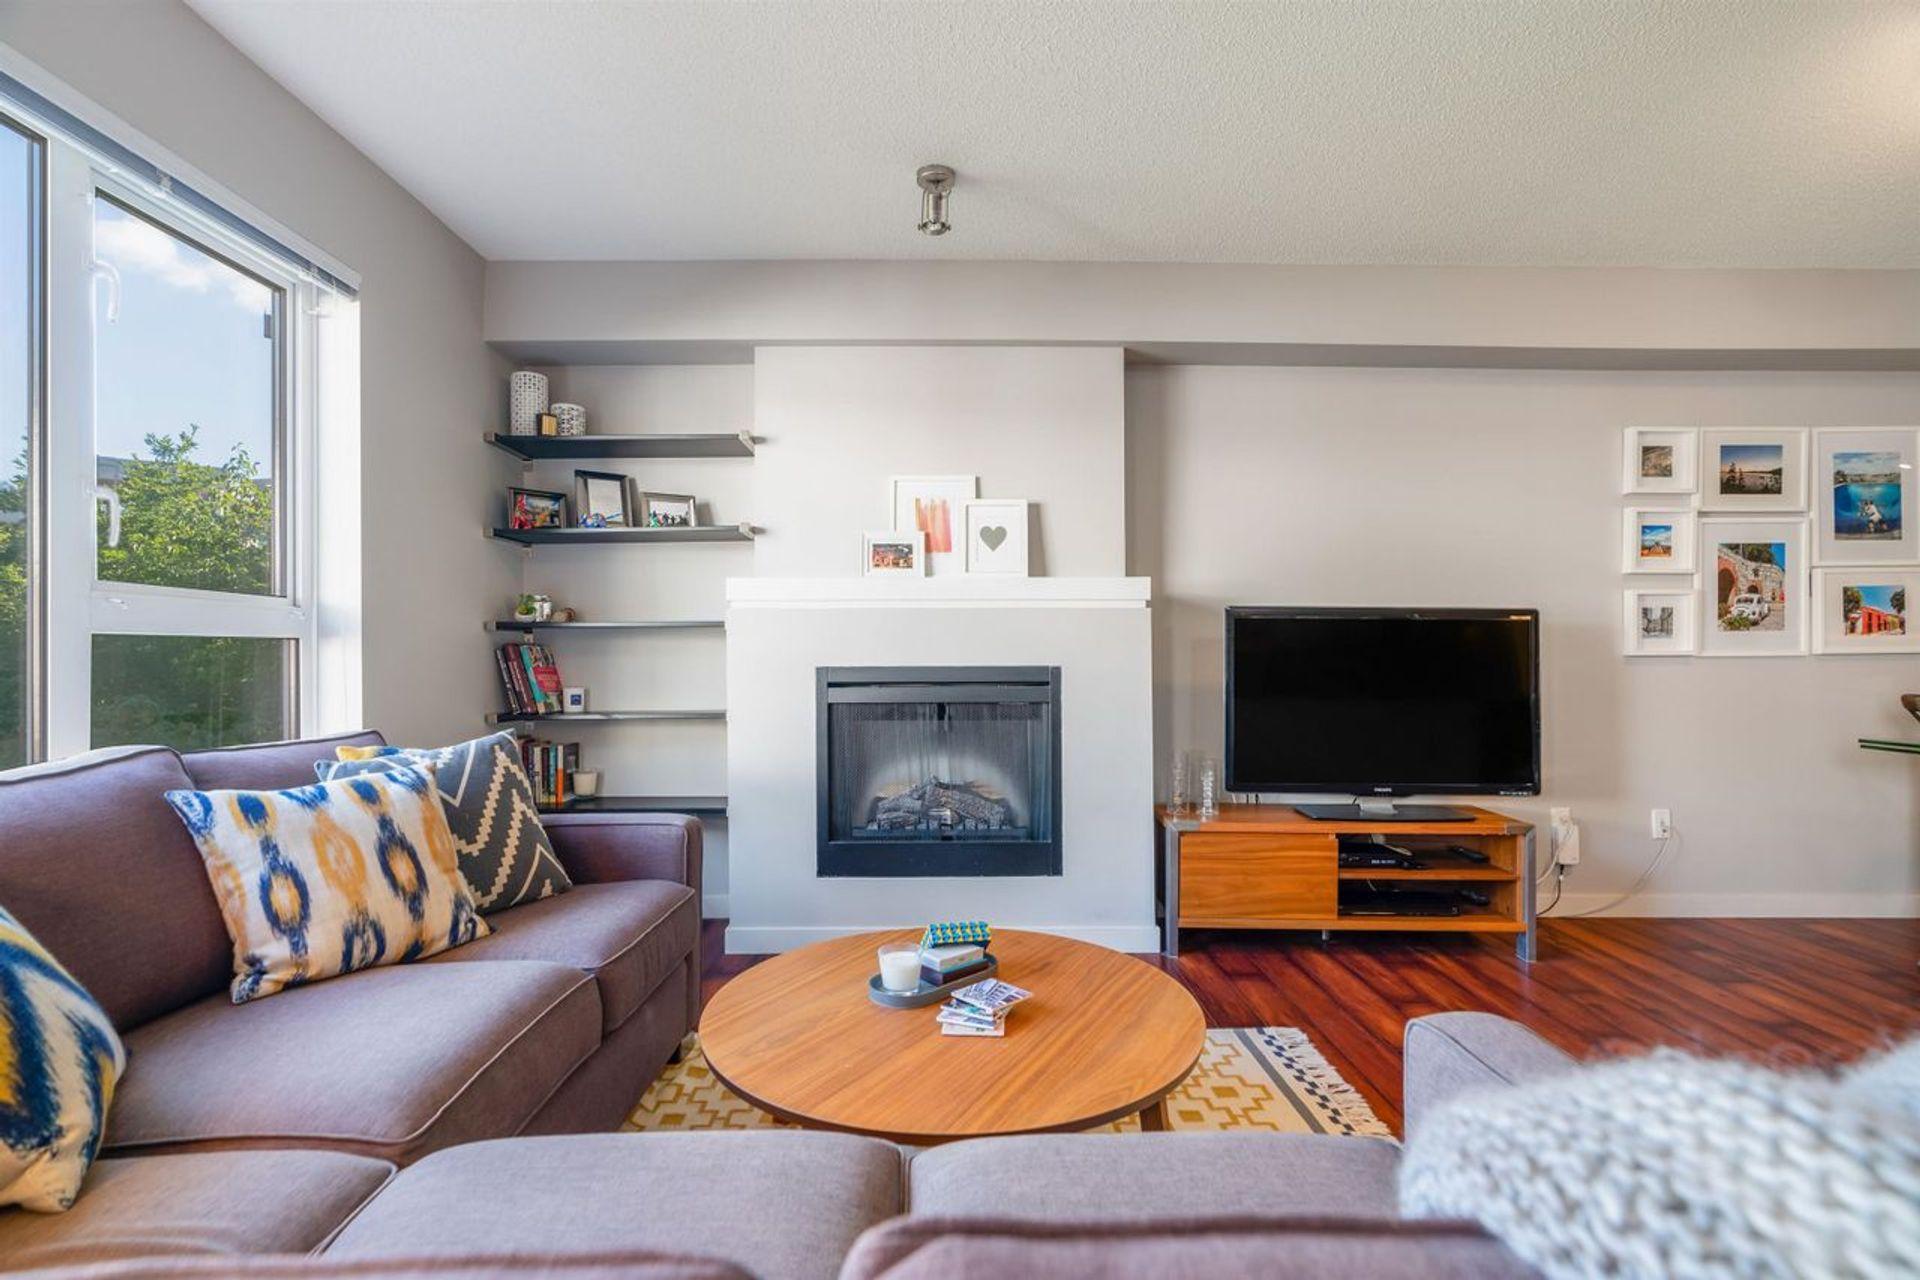 4723-dawson-street-brentwood-park-burnaby-north-04 at 301 - 4723 Dawson Street, Brentwood Park, Burnaby North